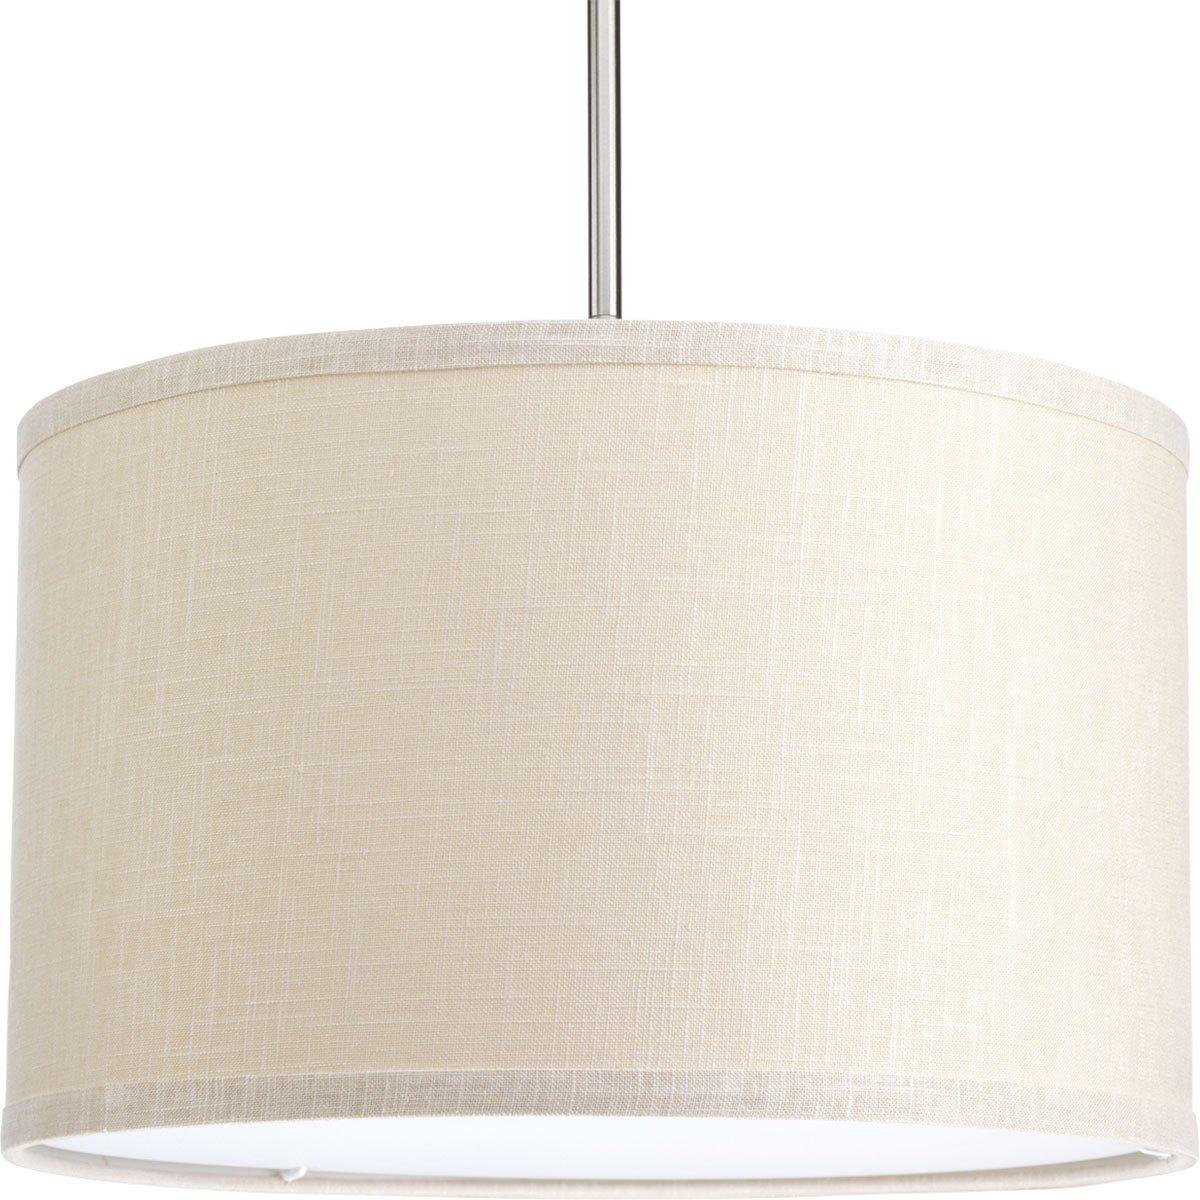 Progress Lighting P8829-56 Accessory Fabric Shade, 16'', Khaki